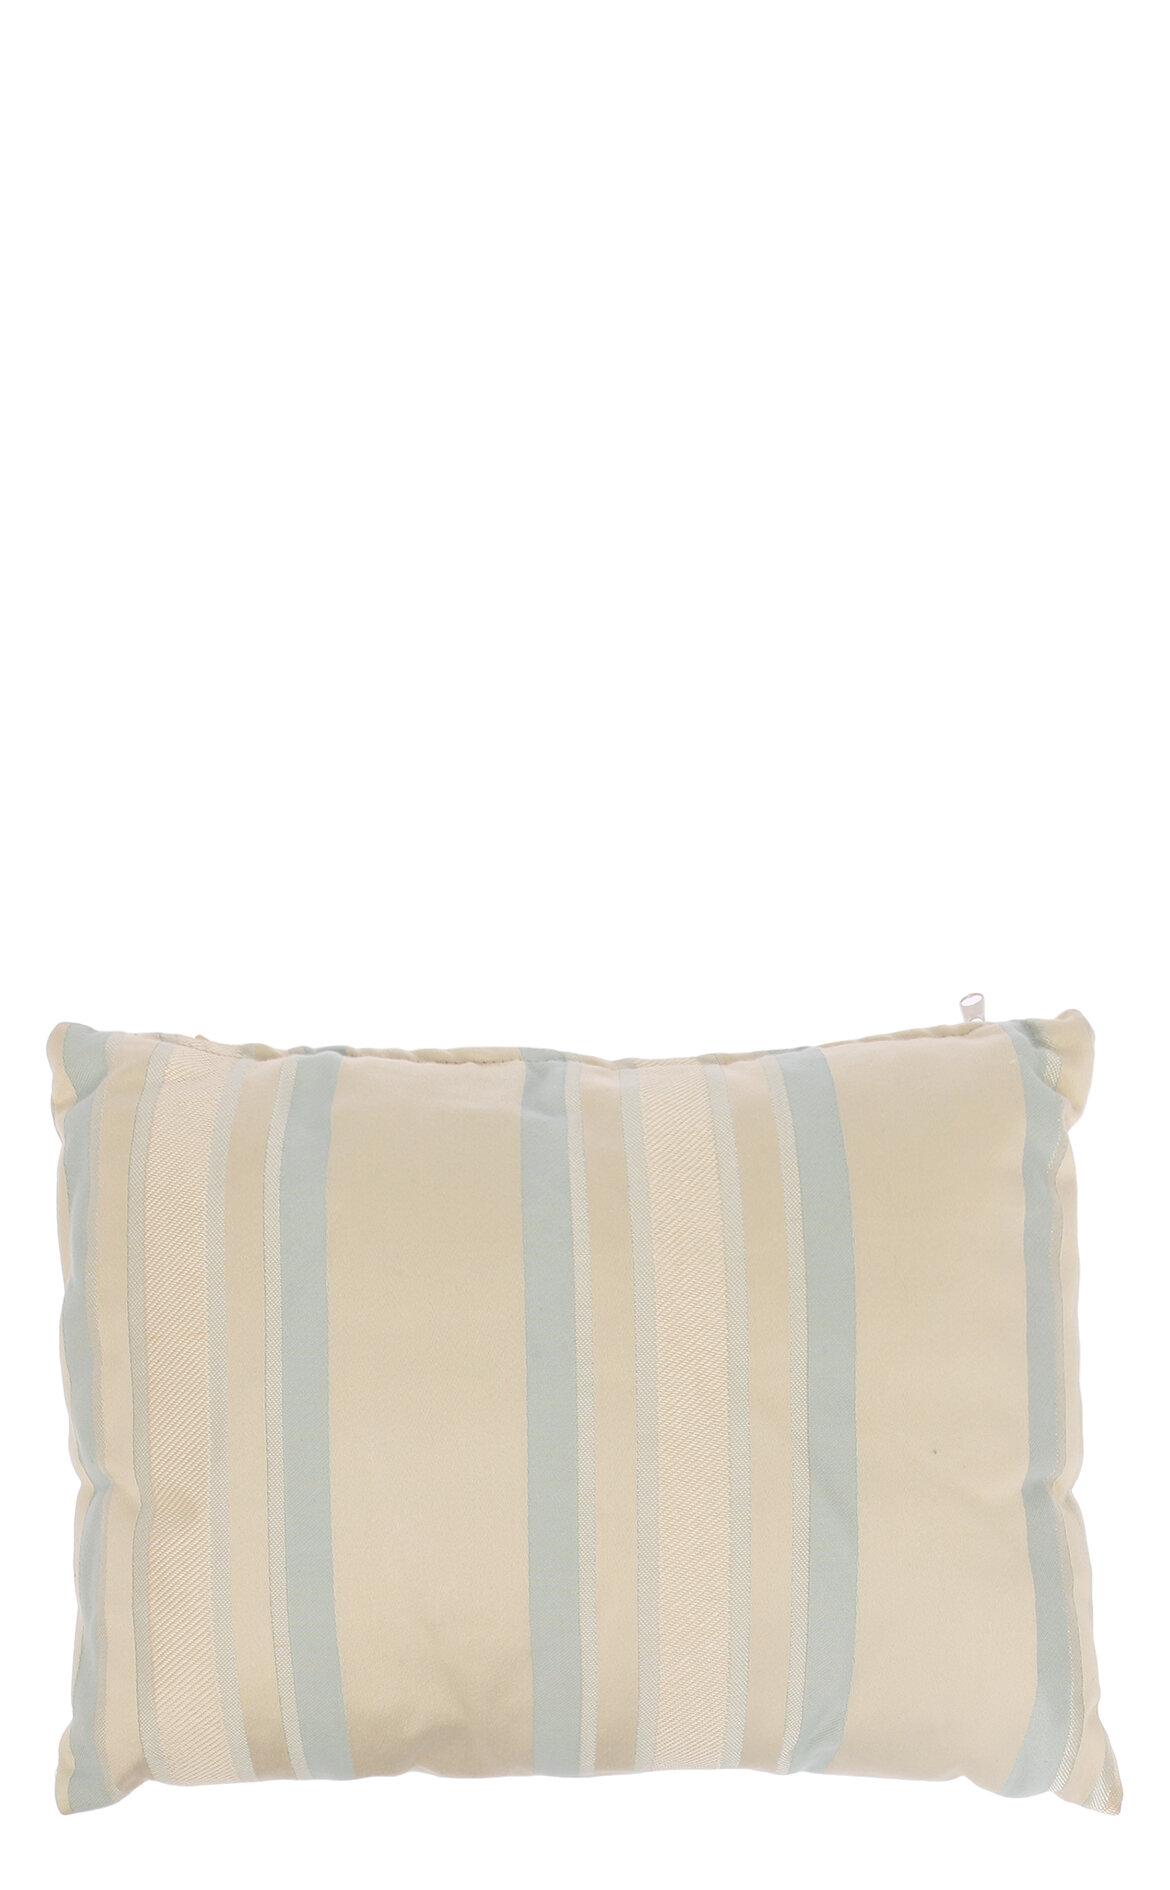 Laura Ashley-Laura Ashley Lcf Awning Stripe Duck Egg 30X40 cm Dekoratif Yastık